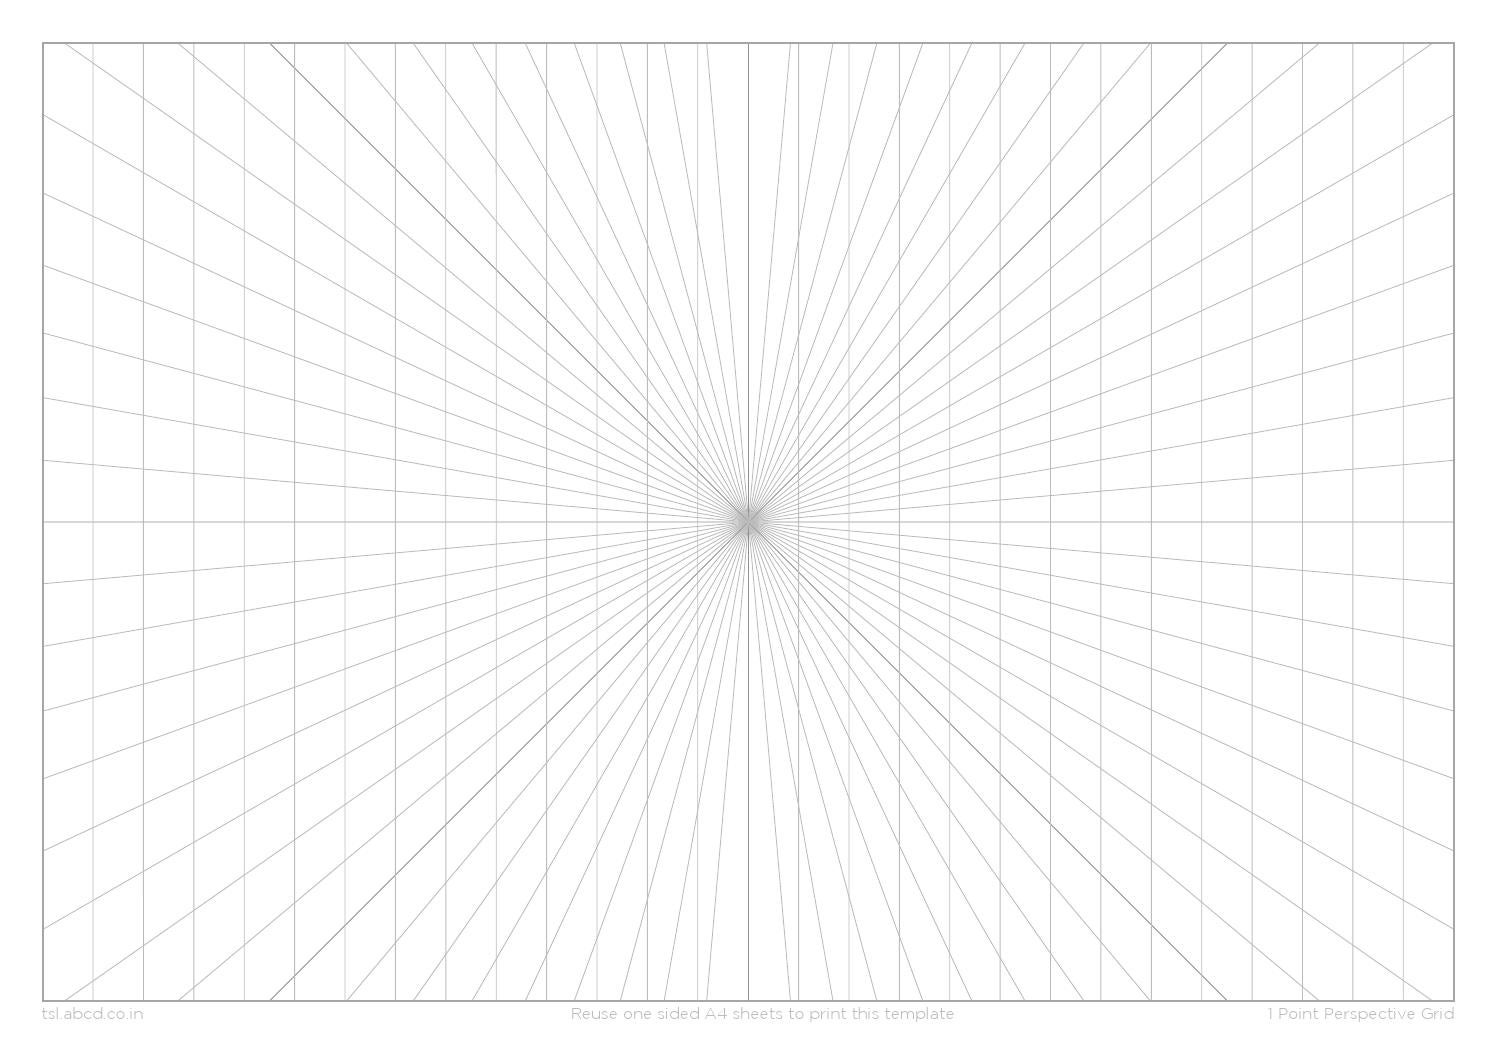 1 2 3 point perspective grid tsl by rohit biyani issuu